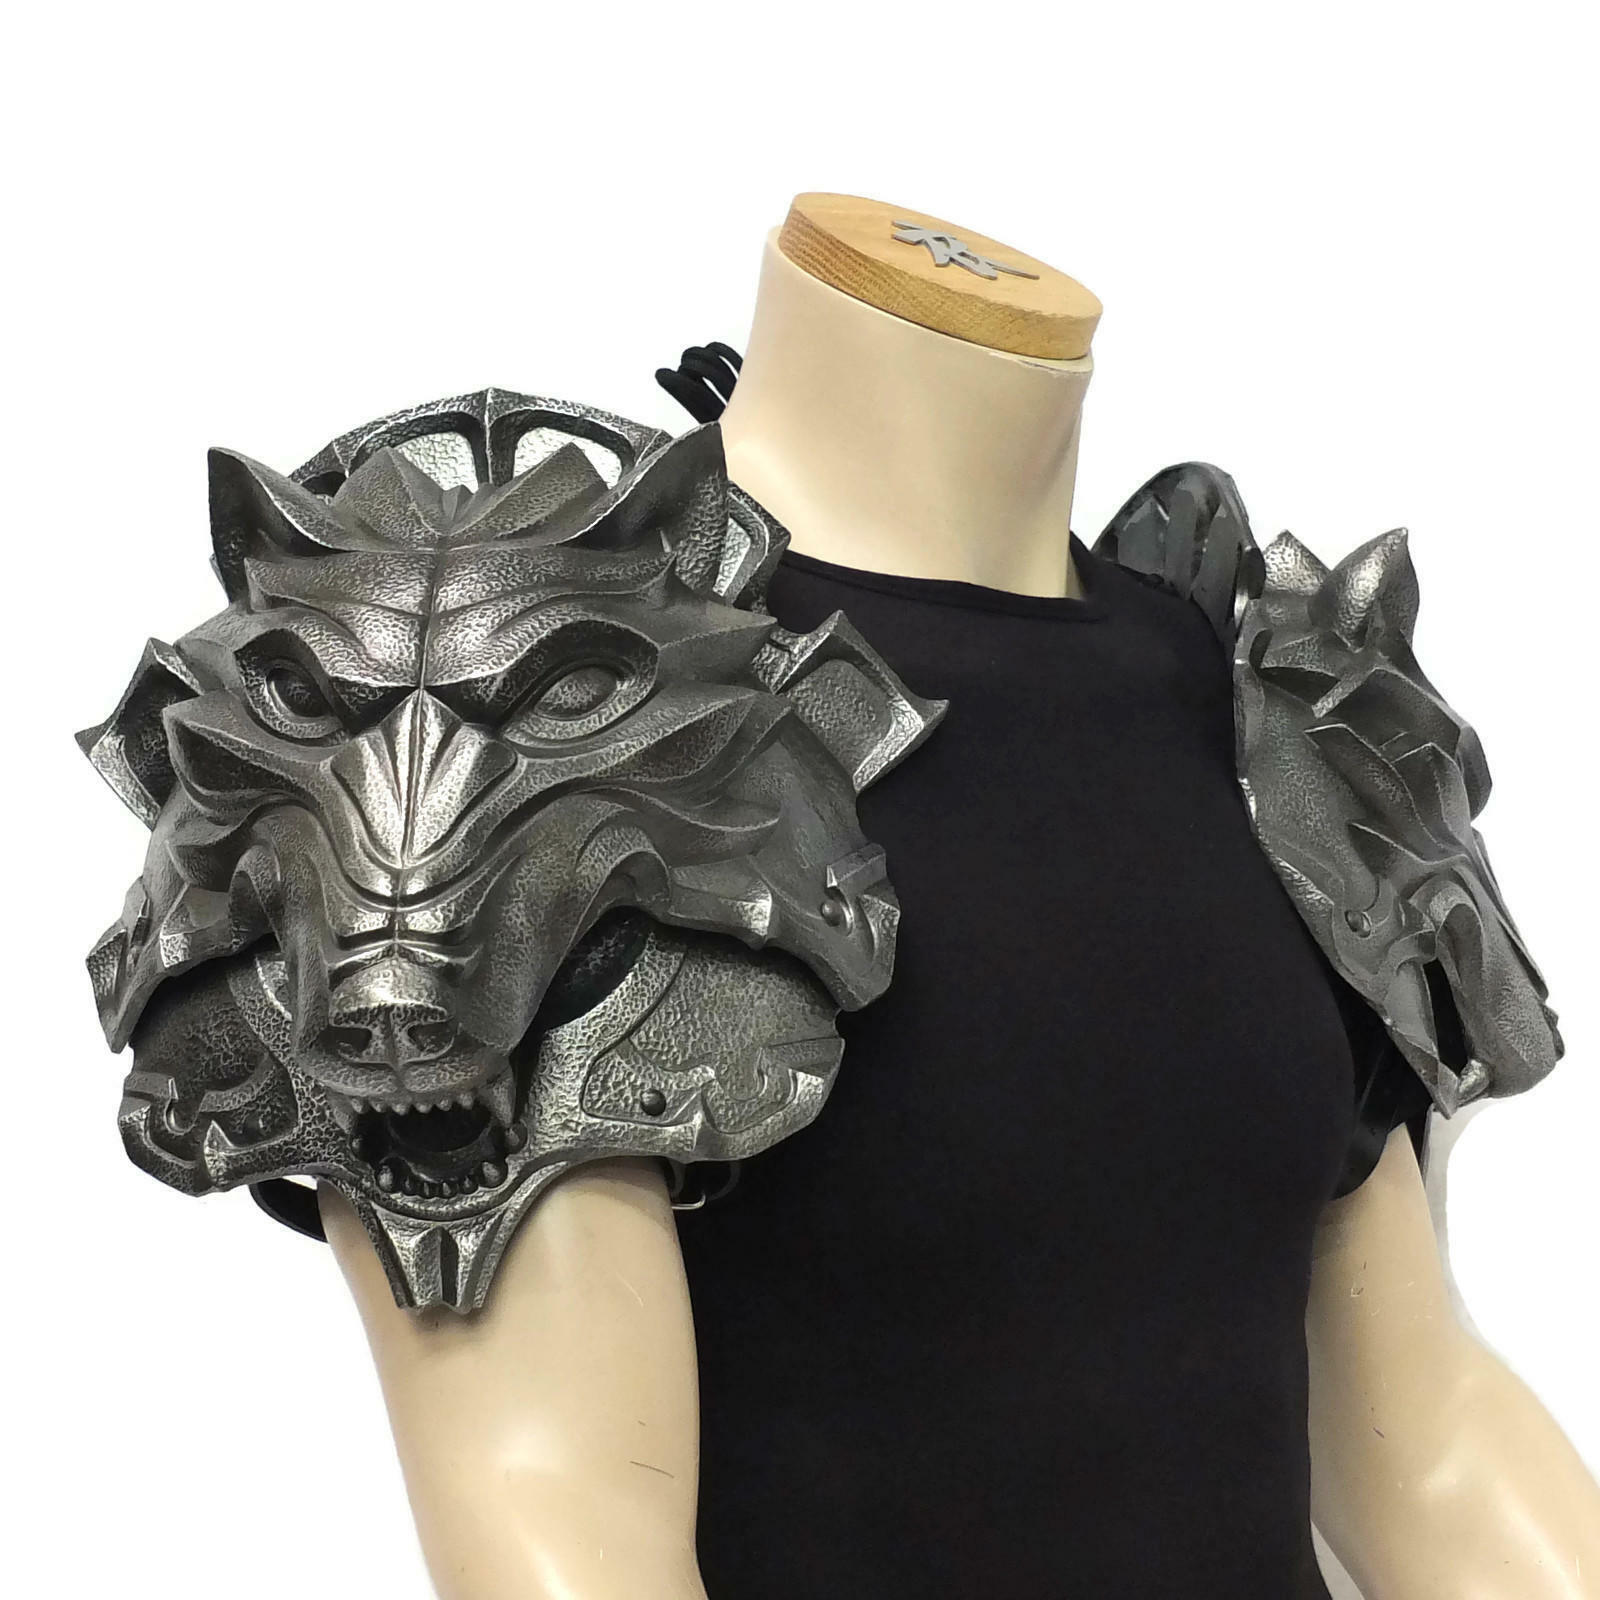 Armadura Larp, cabeza de lobo pauldrons, Larp, SCA, teatral, armadura de hombro